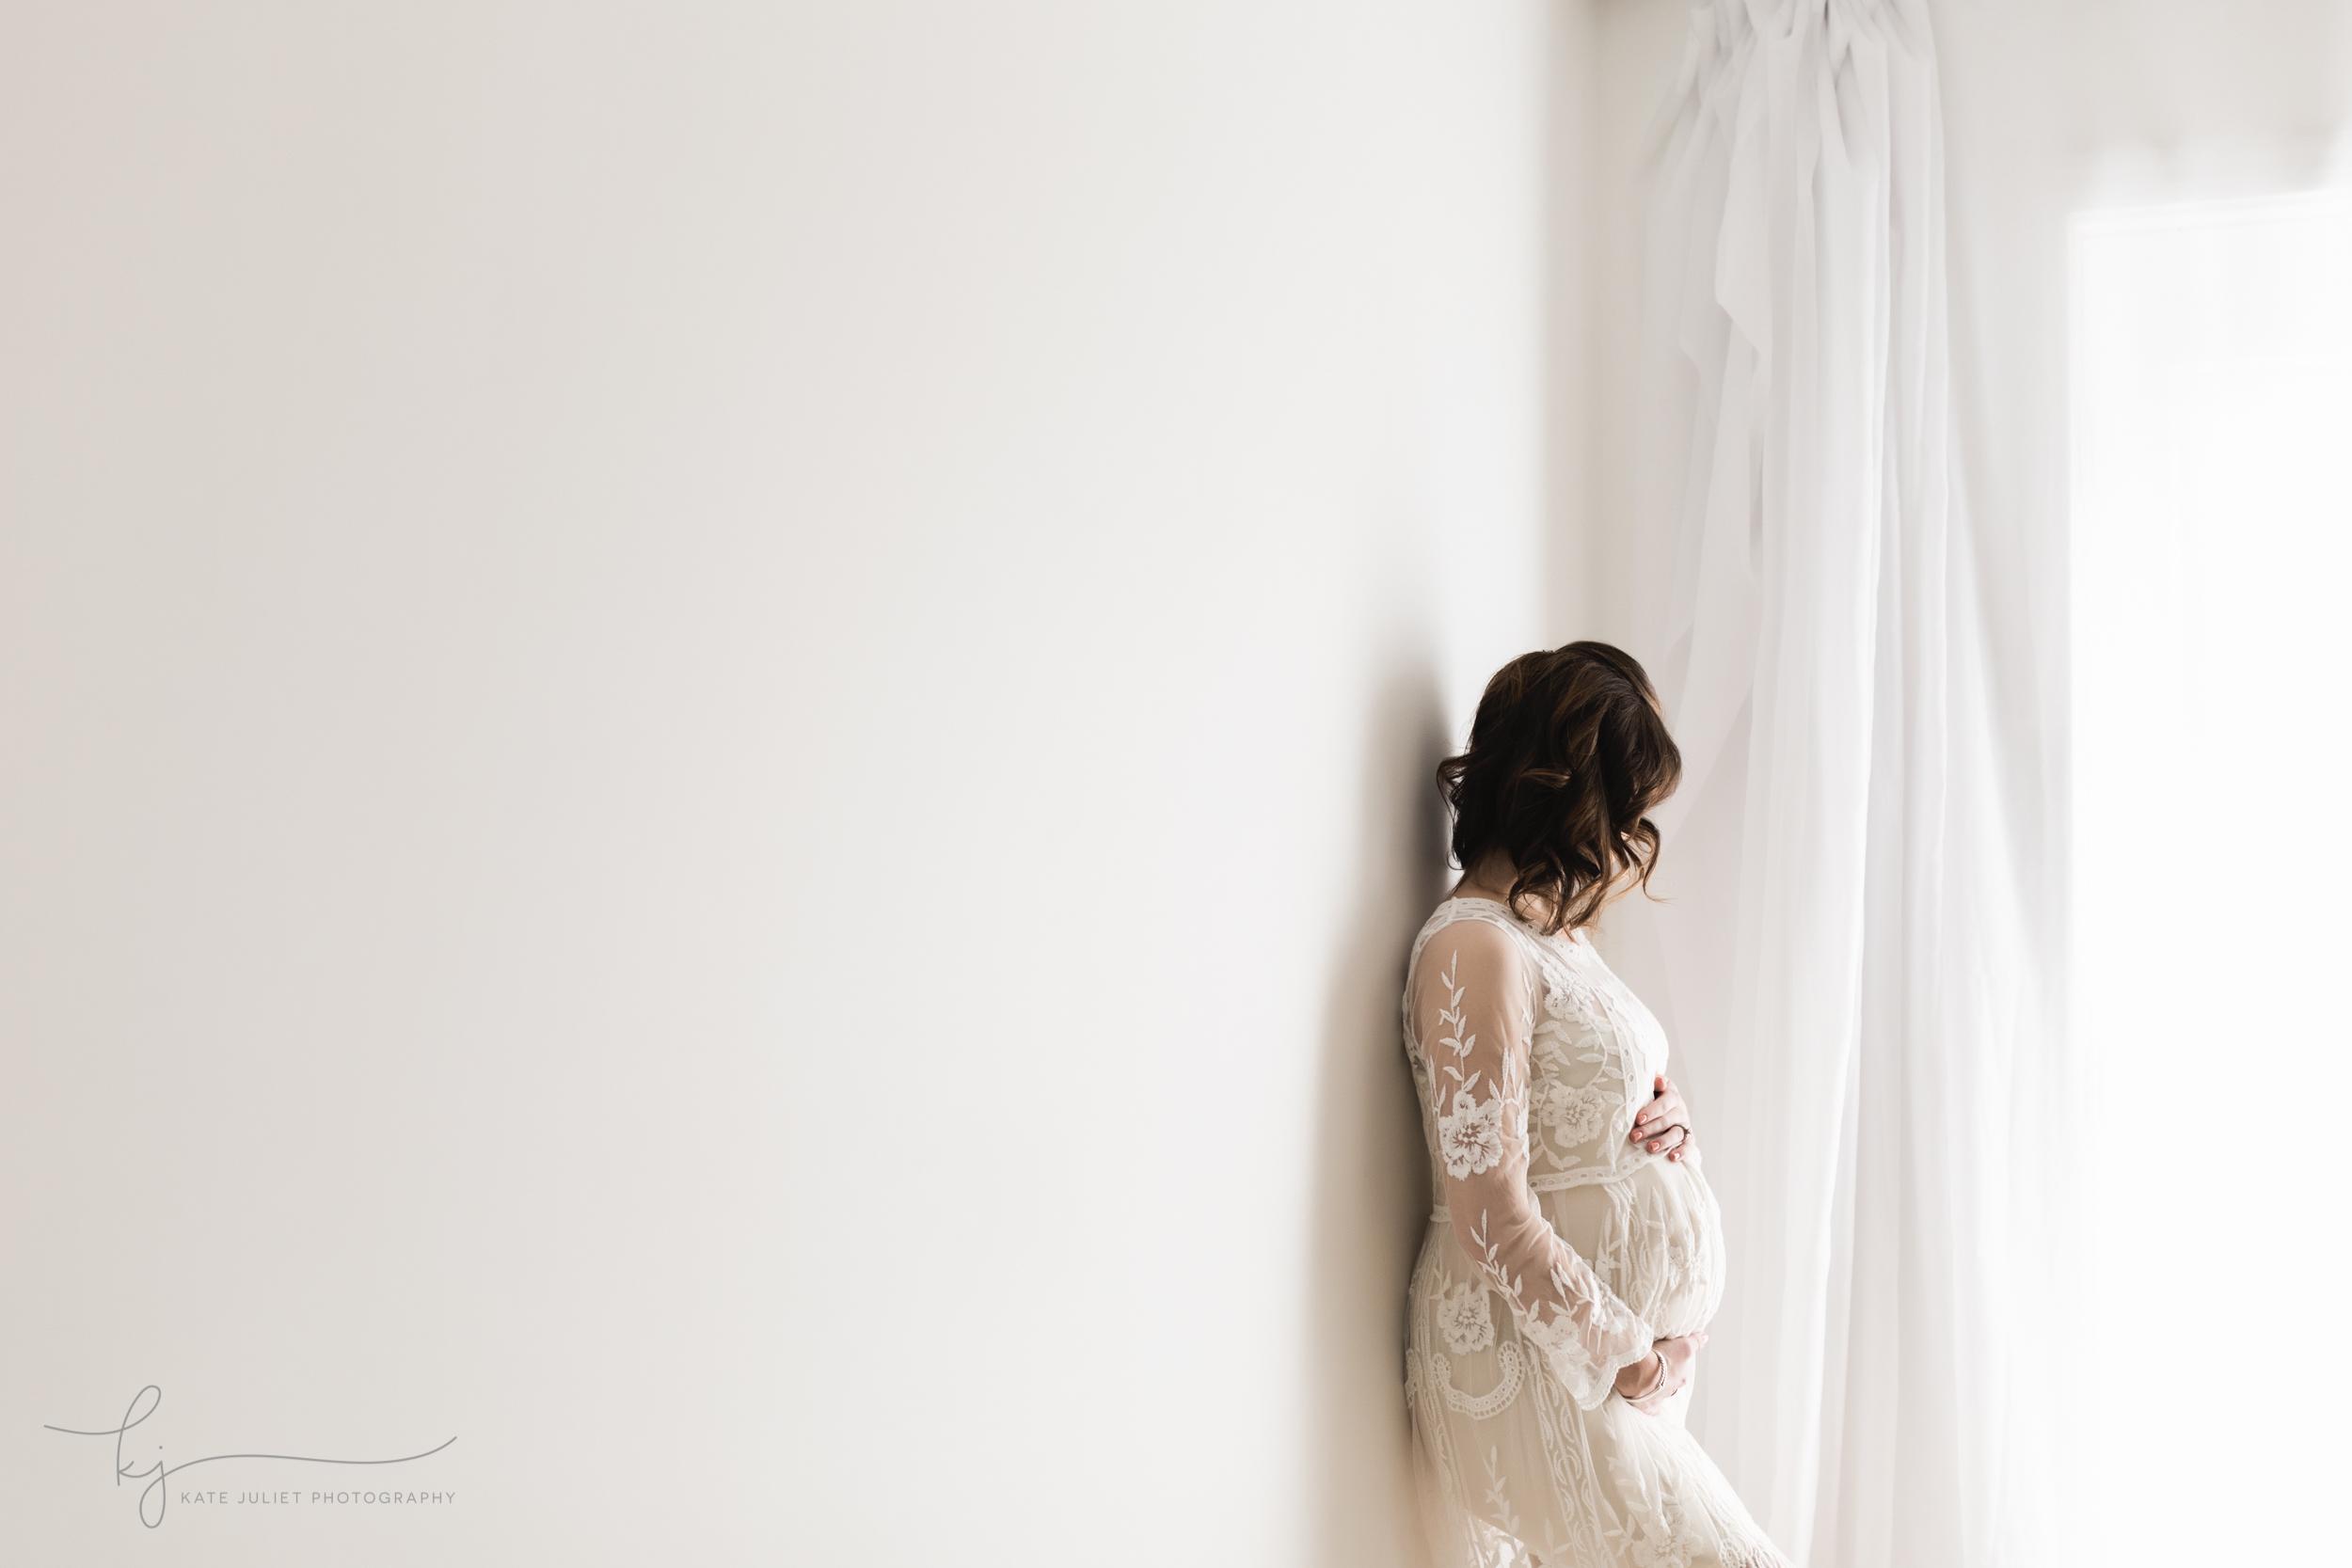 Alexandria VA Maternity Photographer   Kate Juliet Photography